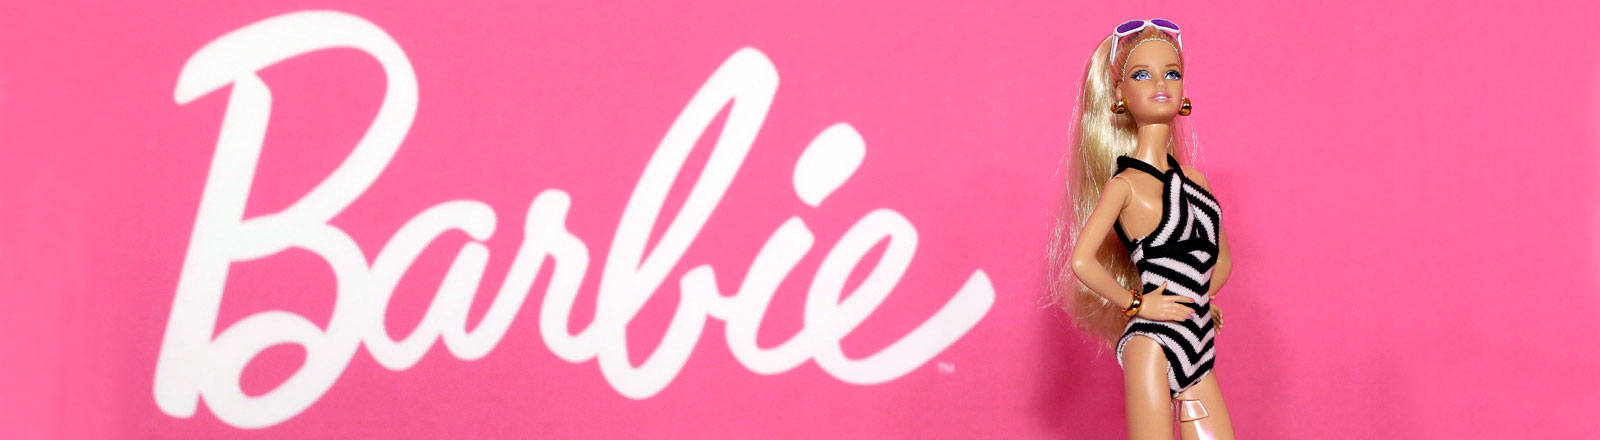 Barbie-Puppe vor Barbie-Schriftzug